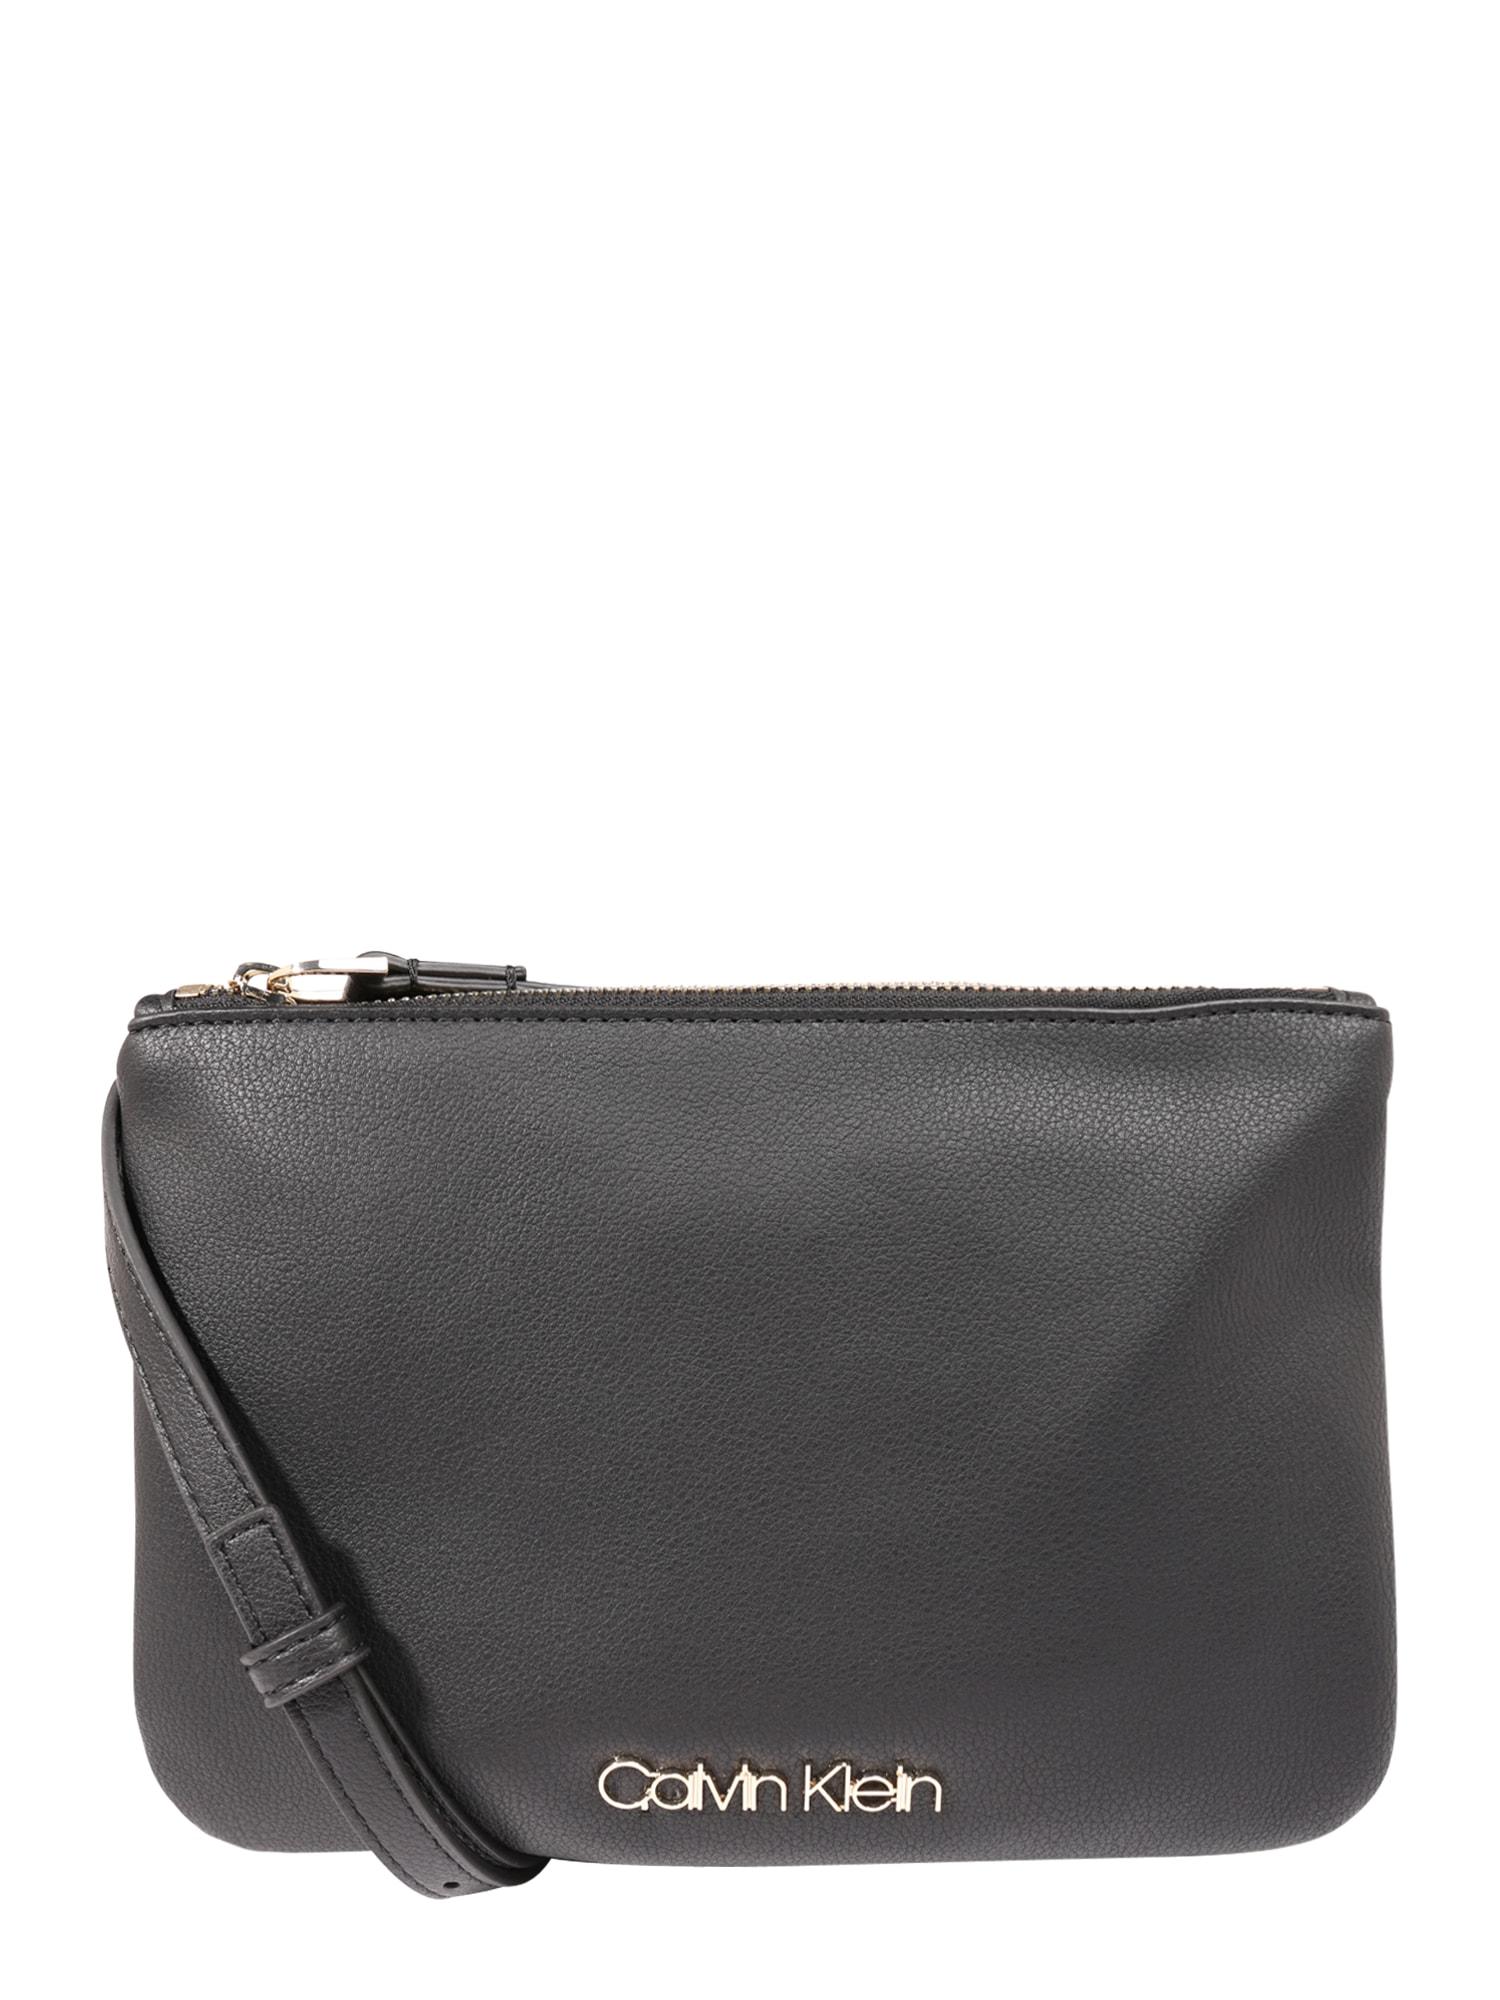 Taška přes rameno CK MUST EW CROSSBODY černá Calvin Klein